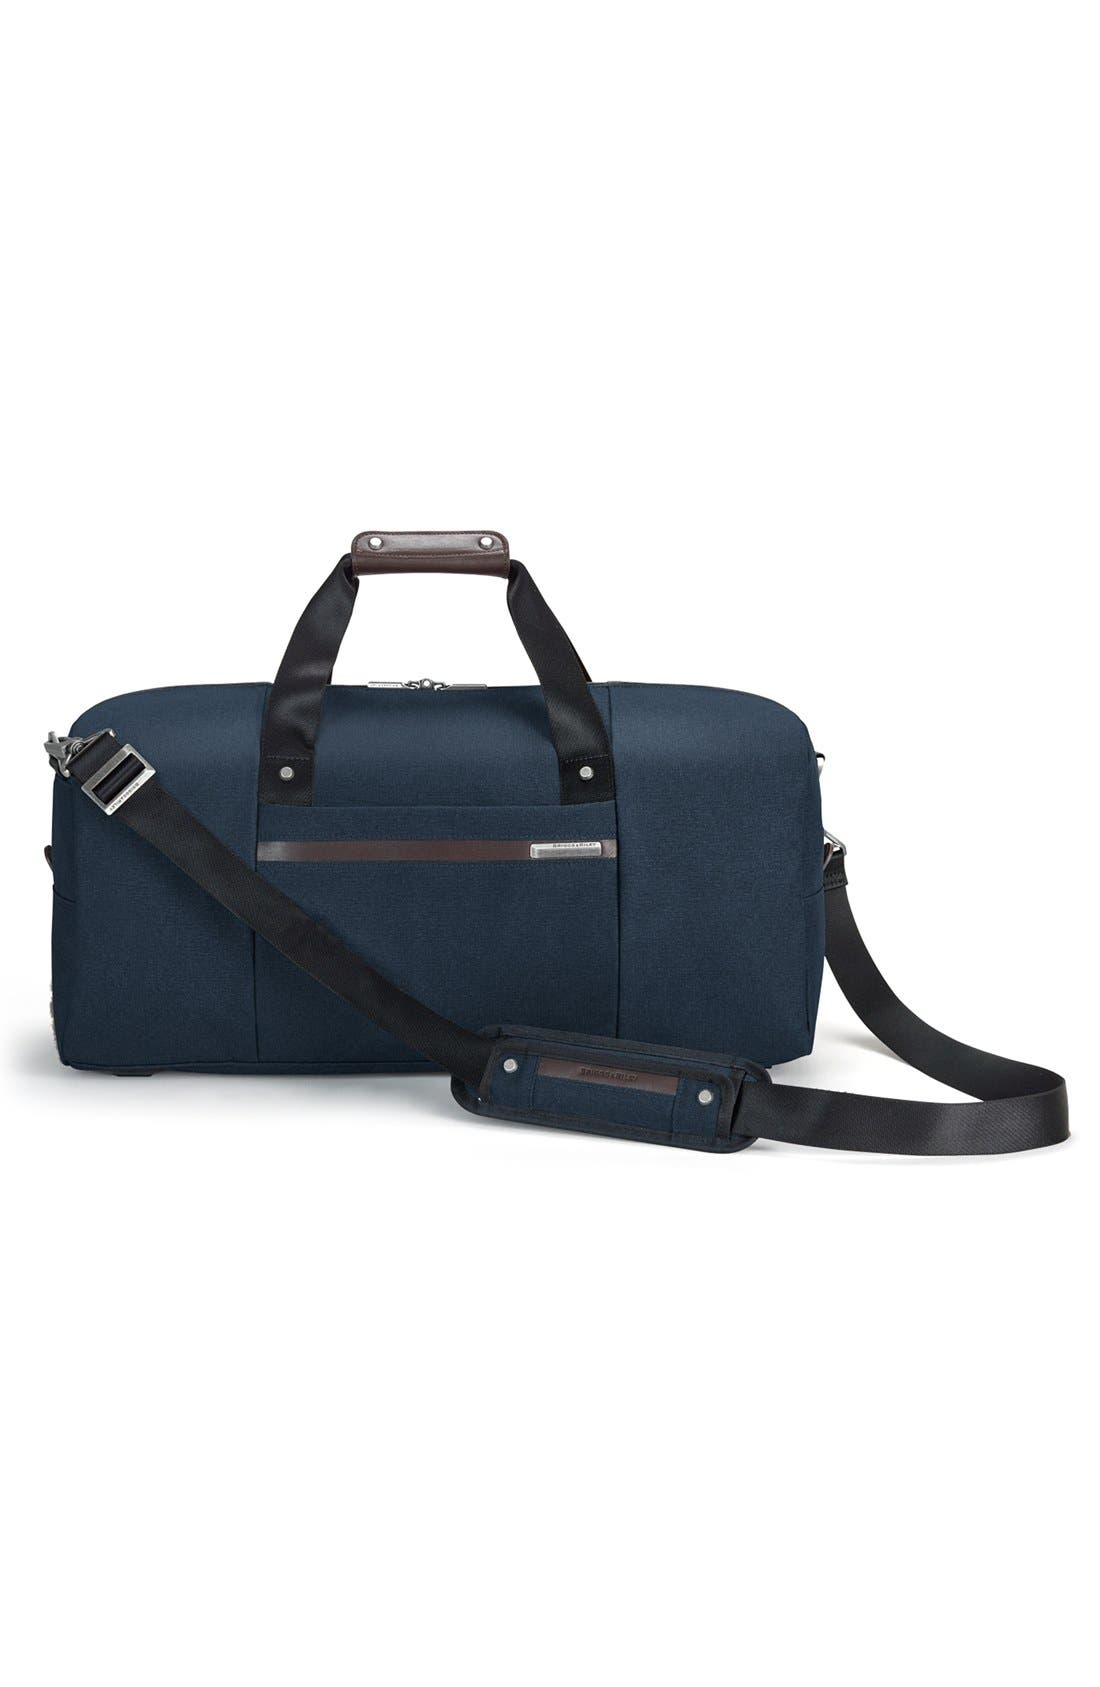 Kinzie Street - Simple Duffel Bag,                             Alternate thumbnail 5, color,                             410